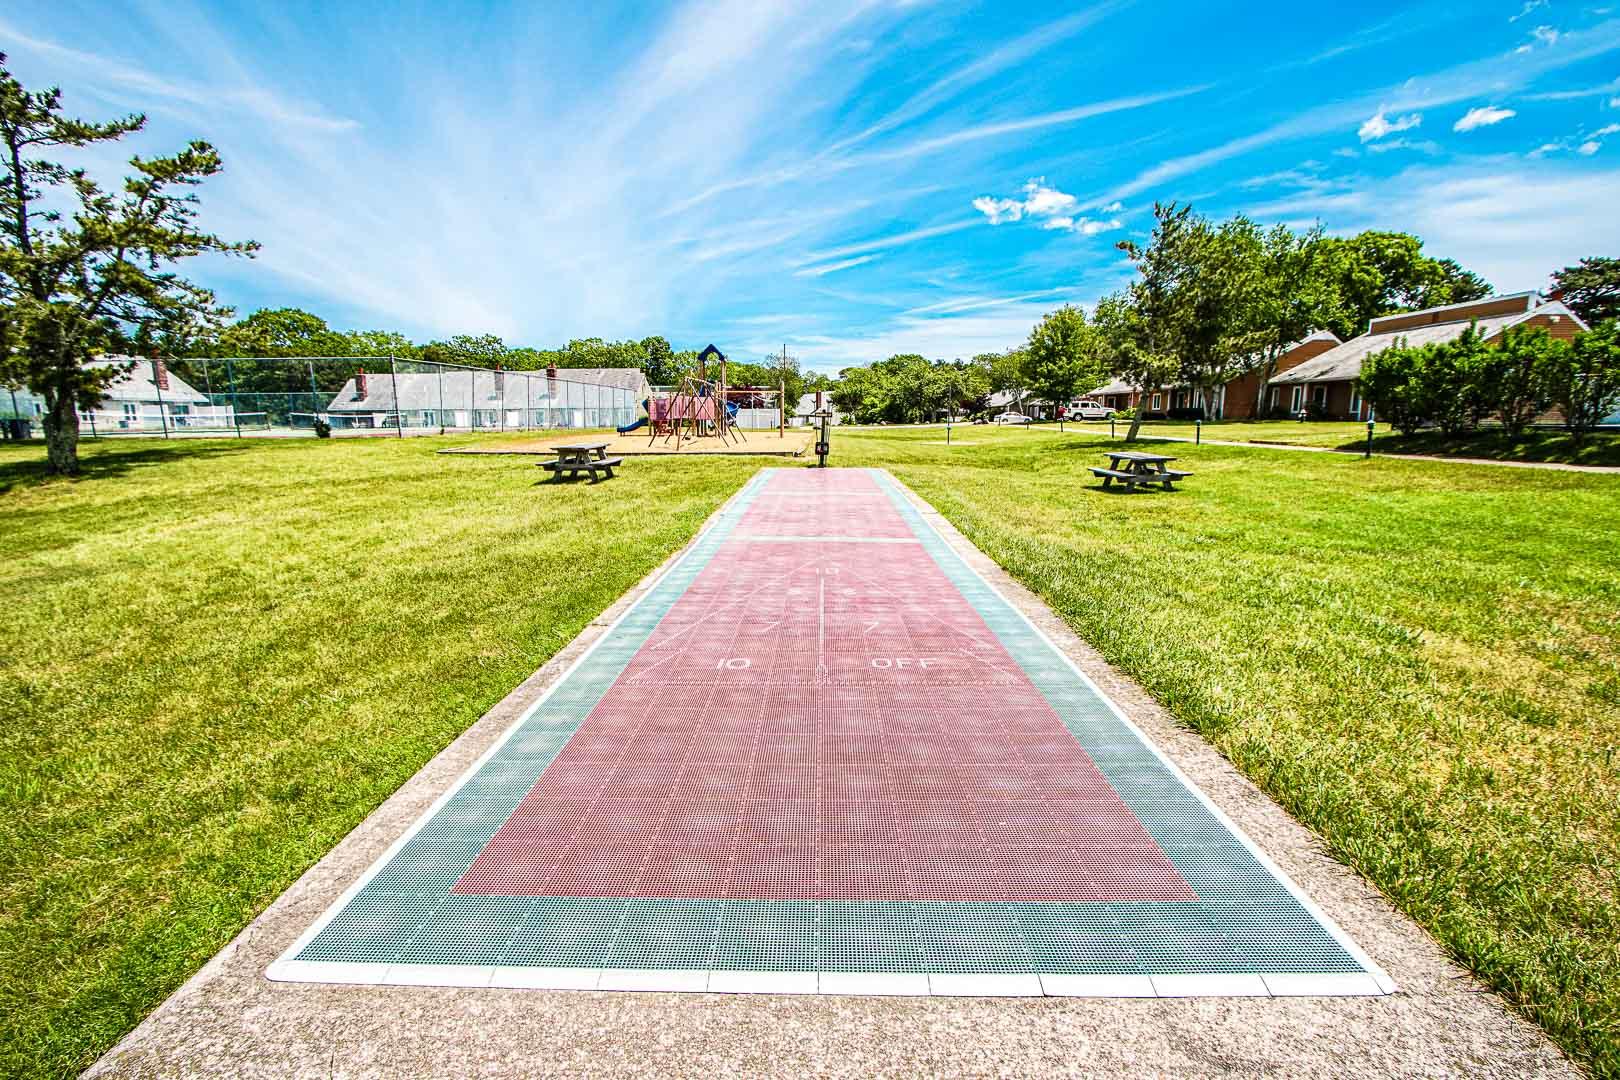 Entertaining amenities that the family can enjoy at VRI's Brewster Green Resort in Massachusetts.